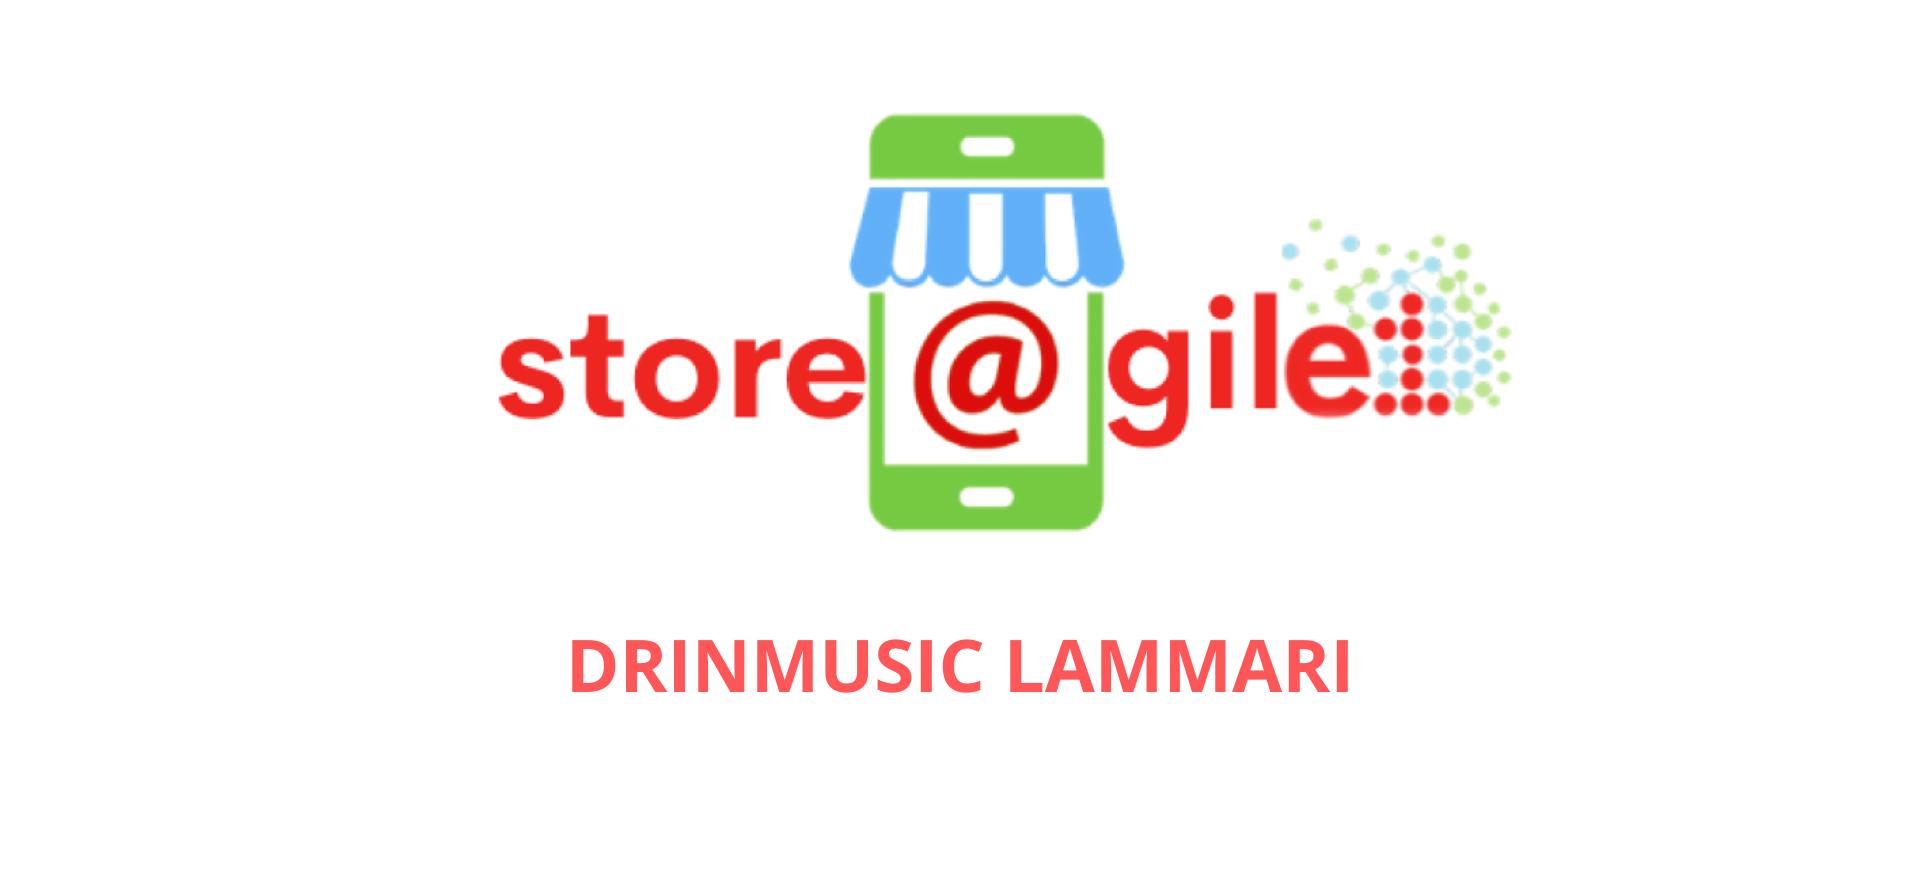 Drinmusic Lammari